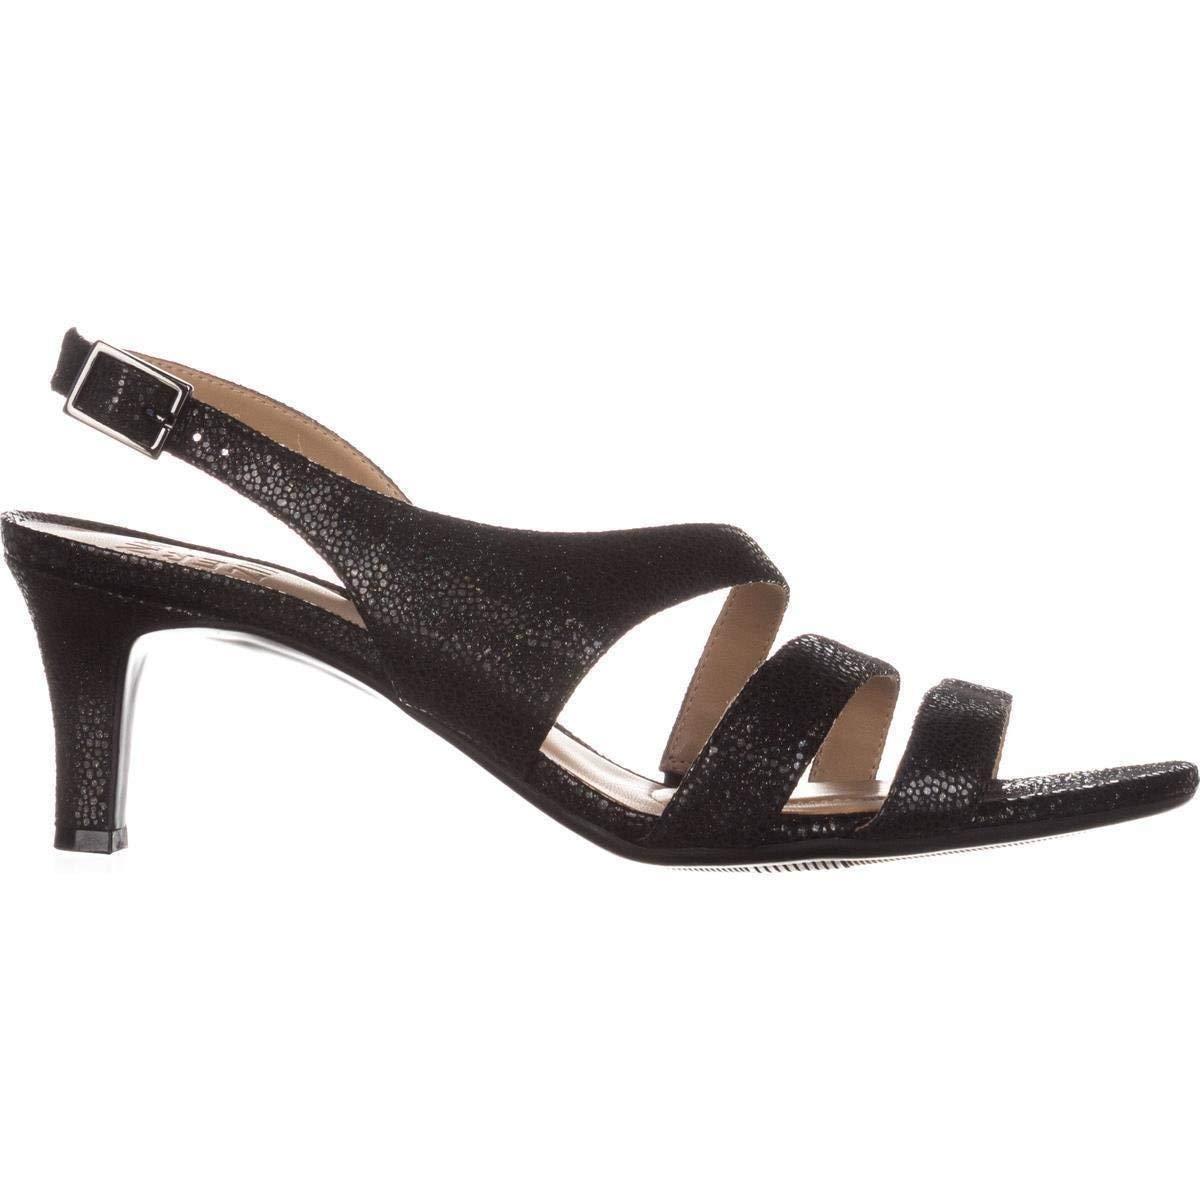 d098bed2d7d2 Naturalizer Womens Tami Open Toe Casual Slingback Sandals